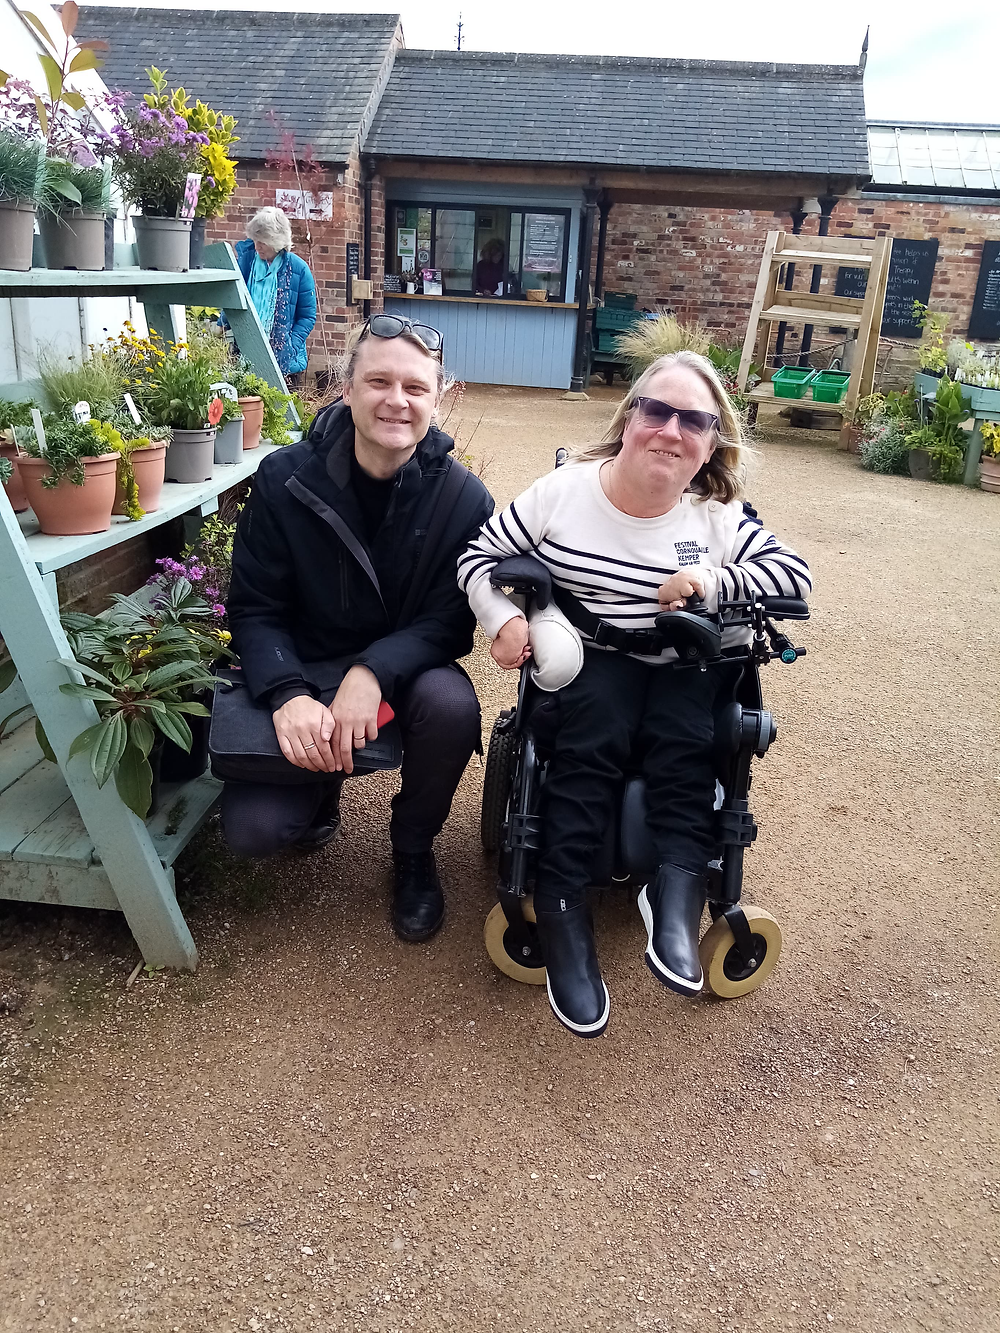 Jamie and Bridget at Helmsley Walled Garden